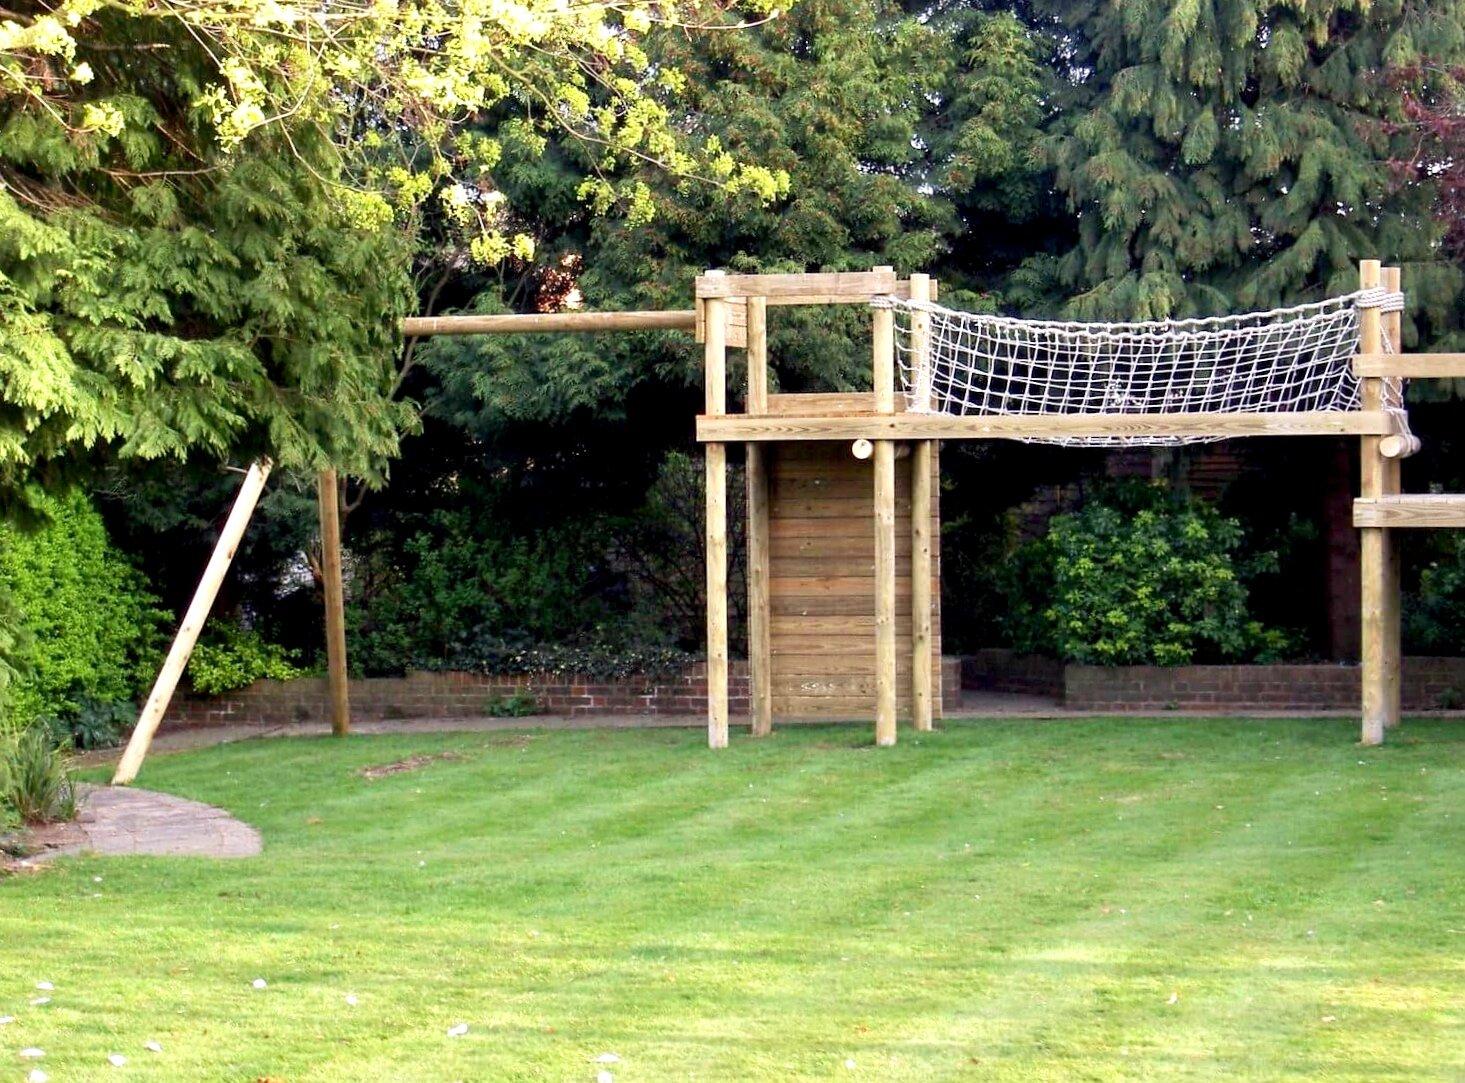 Small Garden Treehouse Play Set Basildon Treehouses Rope Bridges Treetop Walkways And Nest Swings